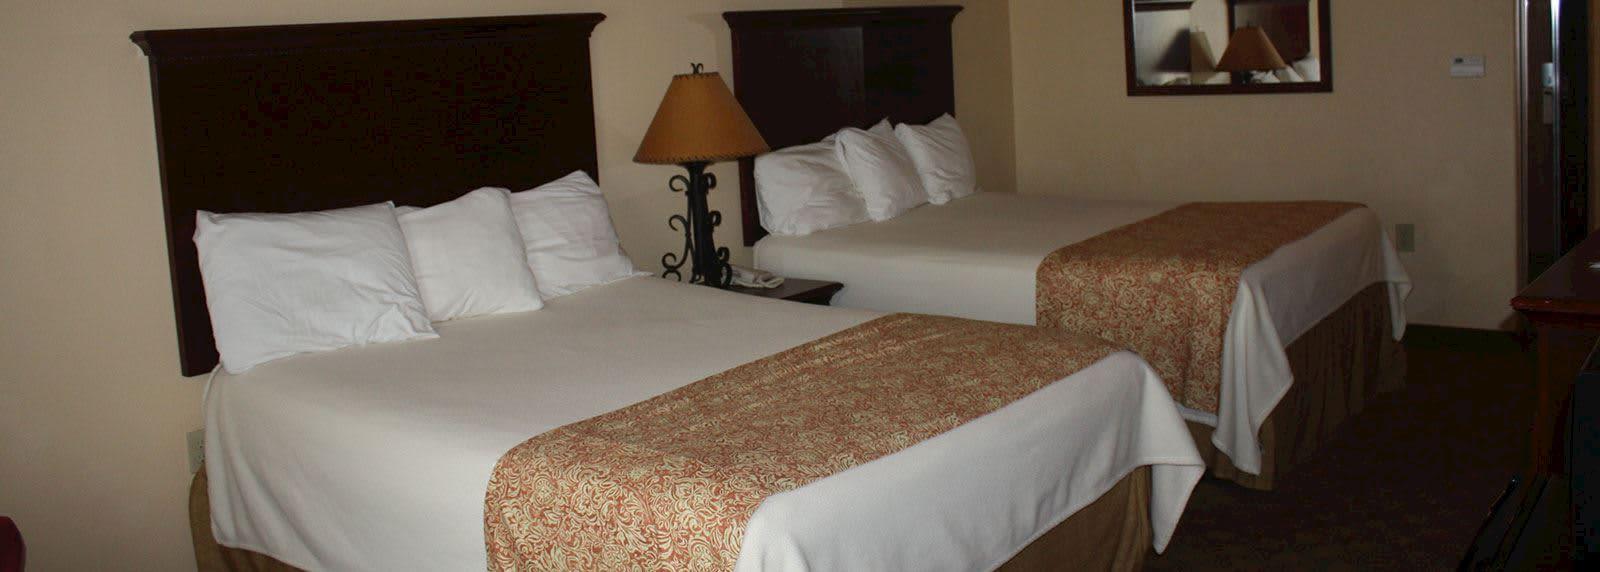 Hotel Texas Hallettsville